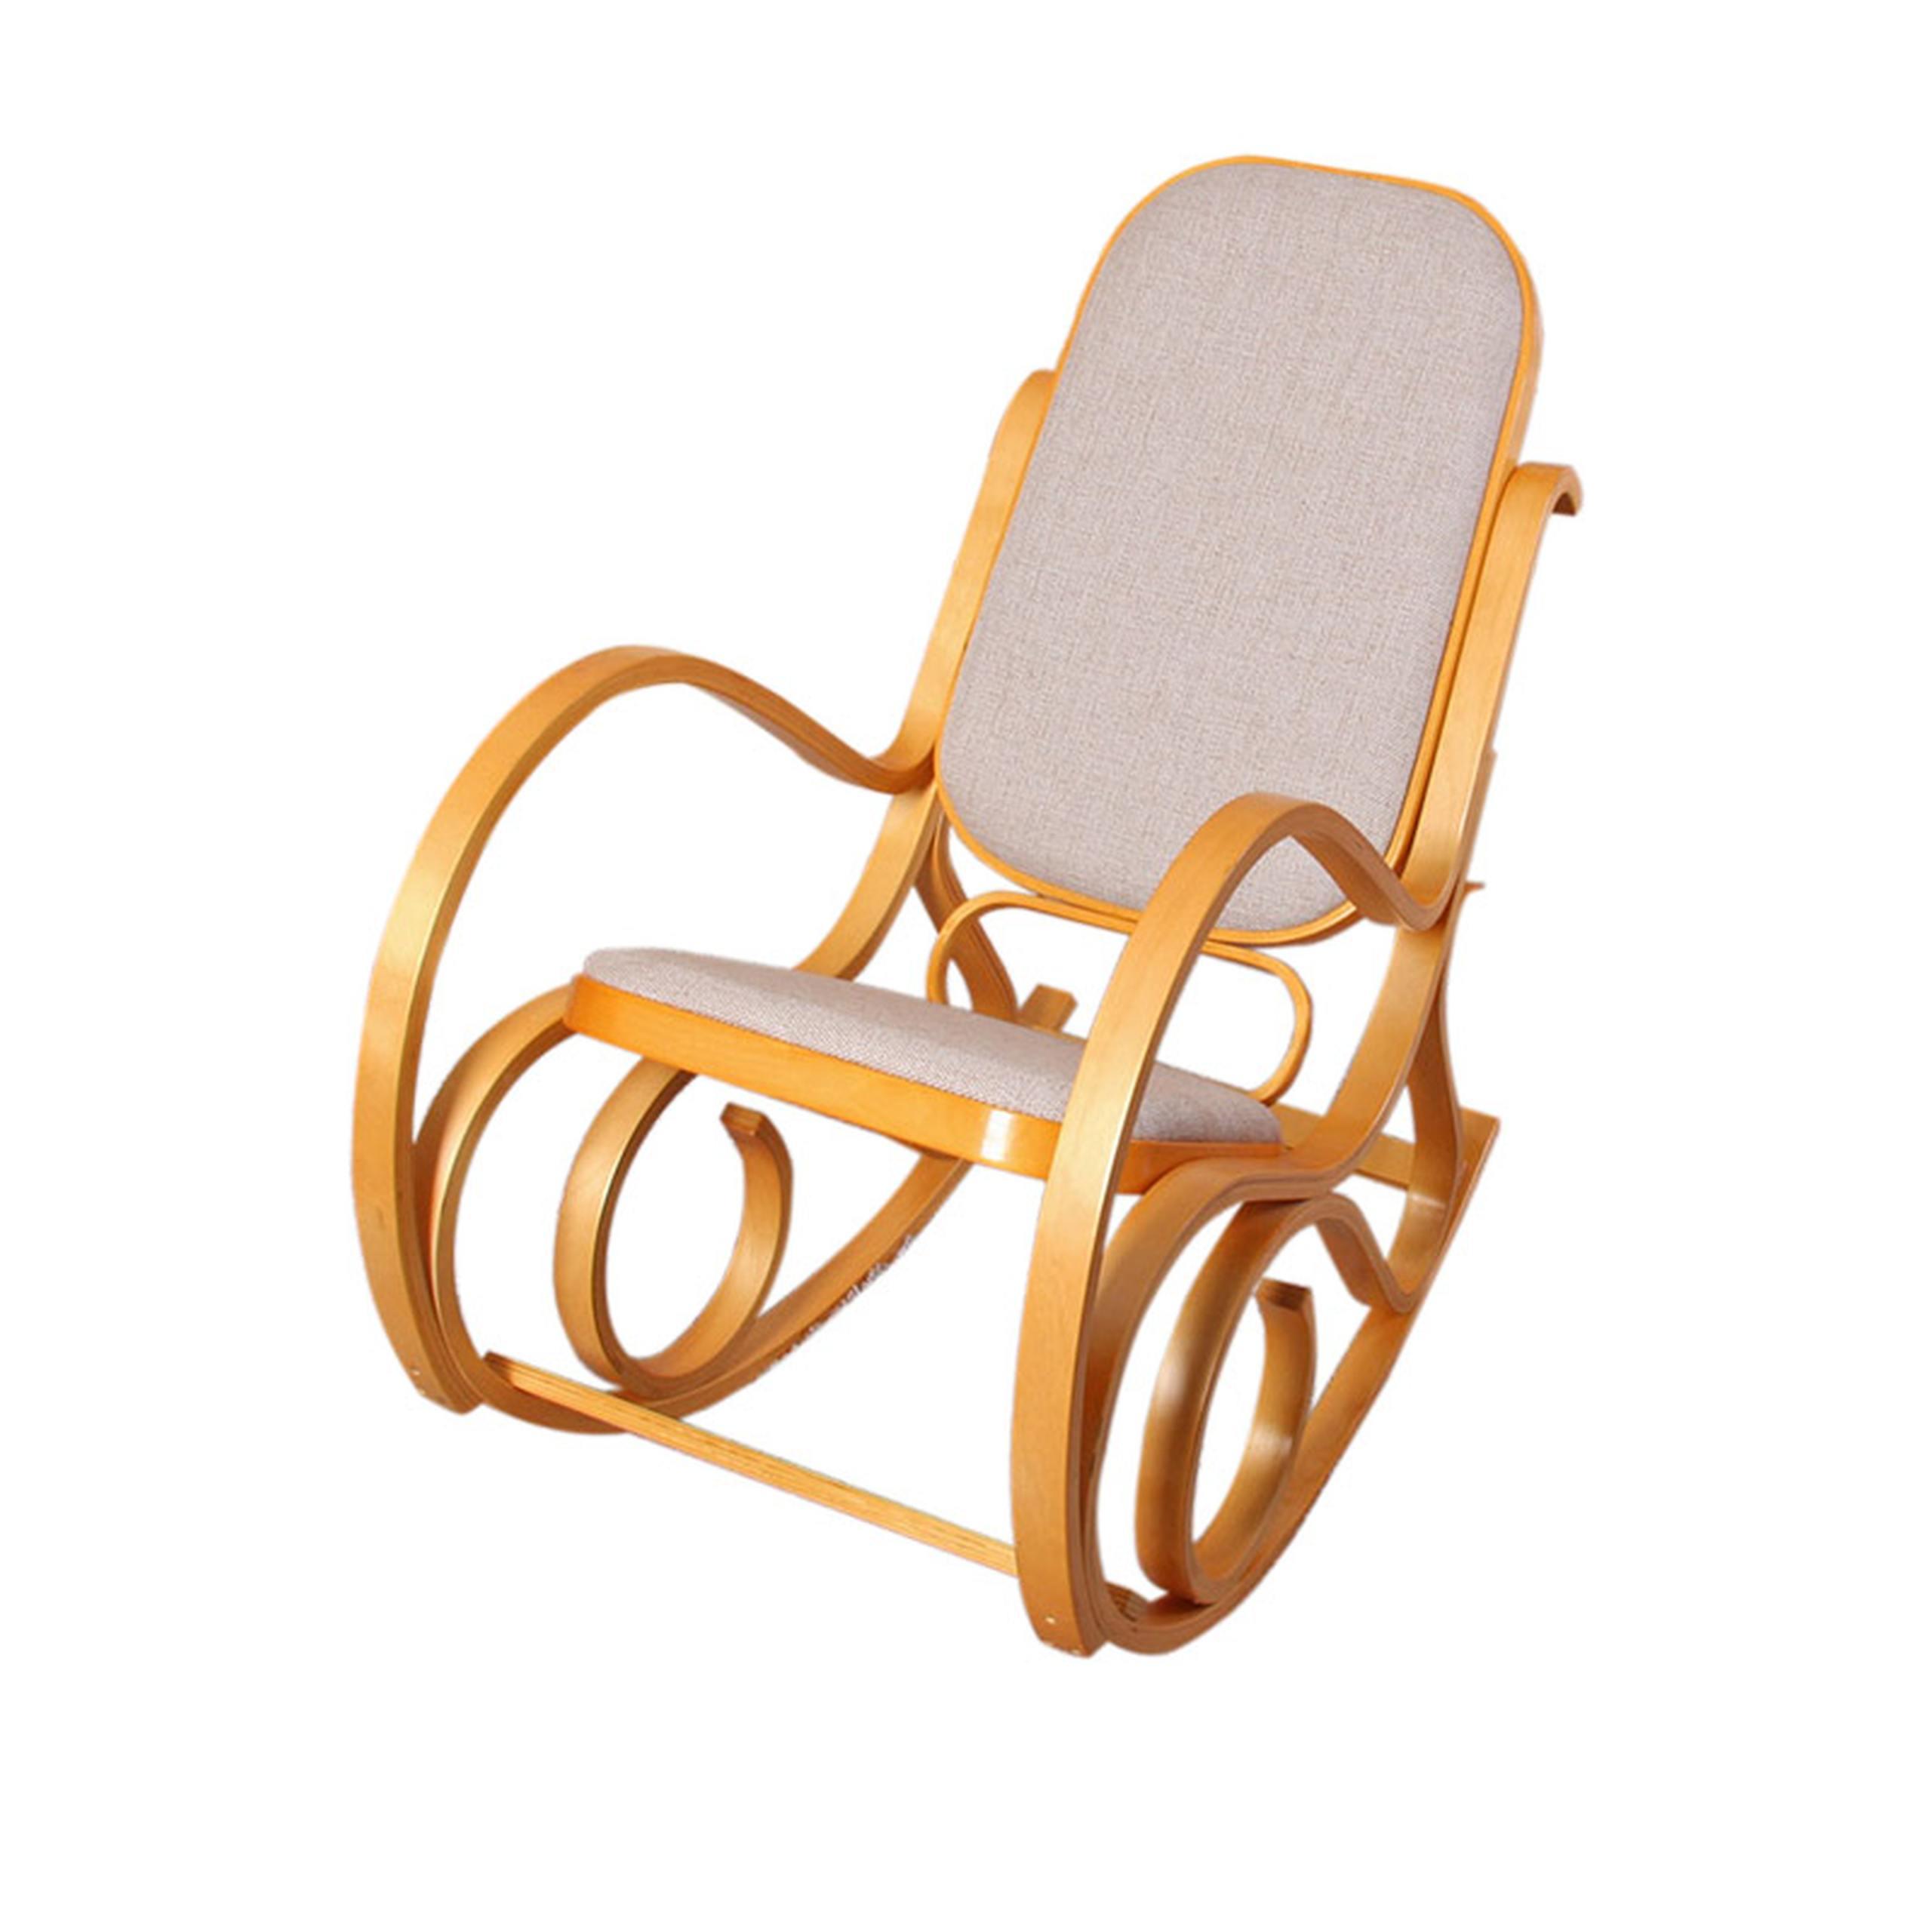 schaukelstuhl schwingsessel m41 aus holz eiche stoff beige. Black Bedroom Furniture Sets. Home Design Ideas